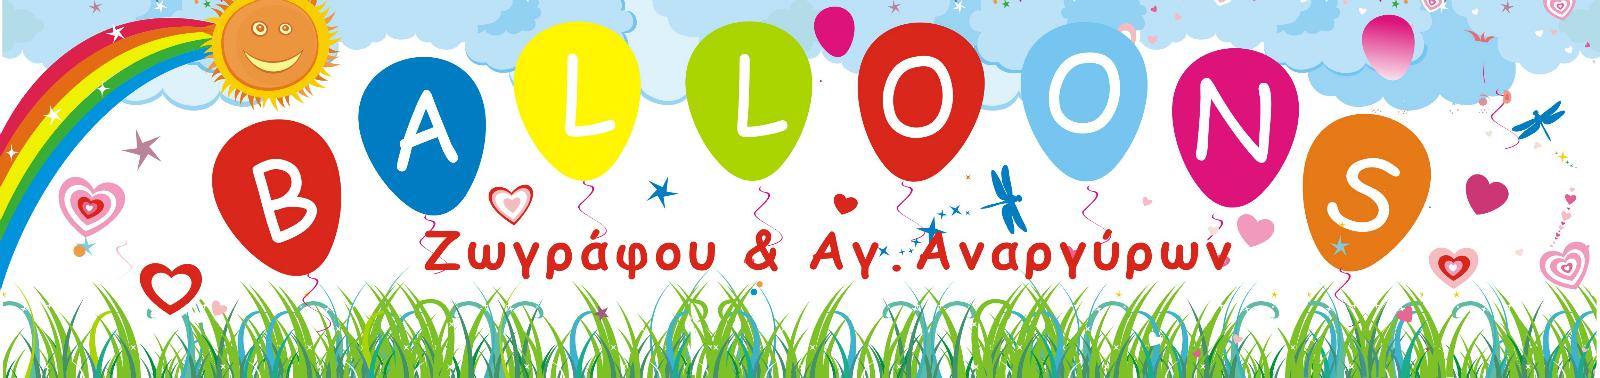 Balloons Ζωγράφου & Αγίων Αναργύρων